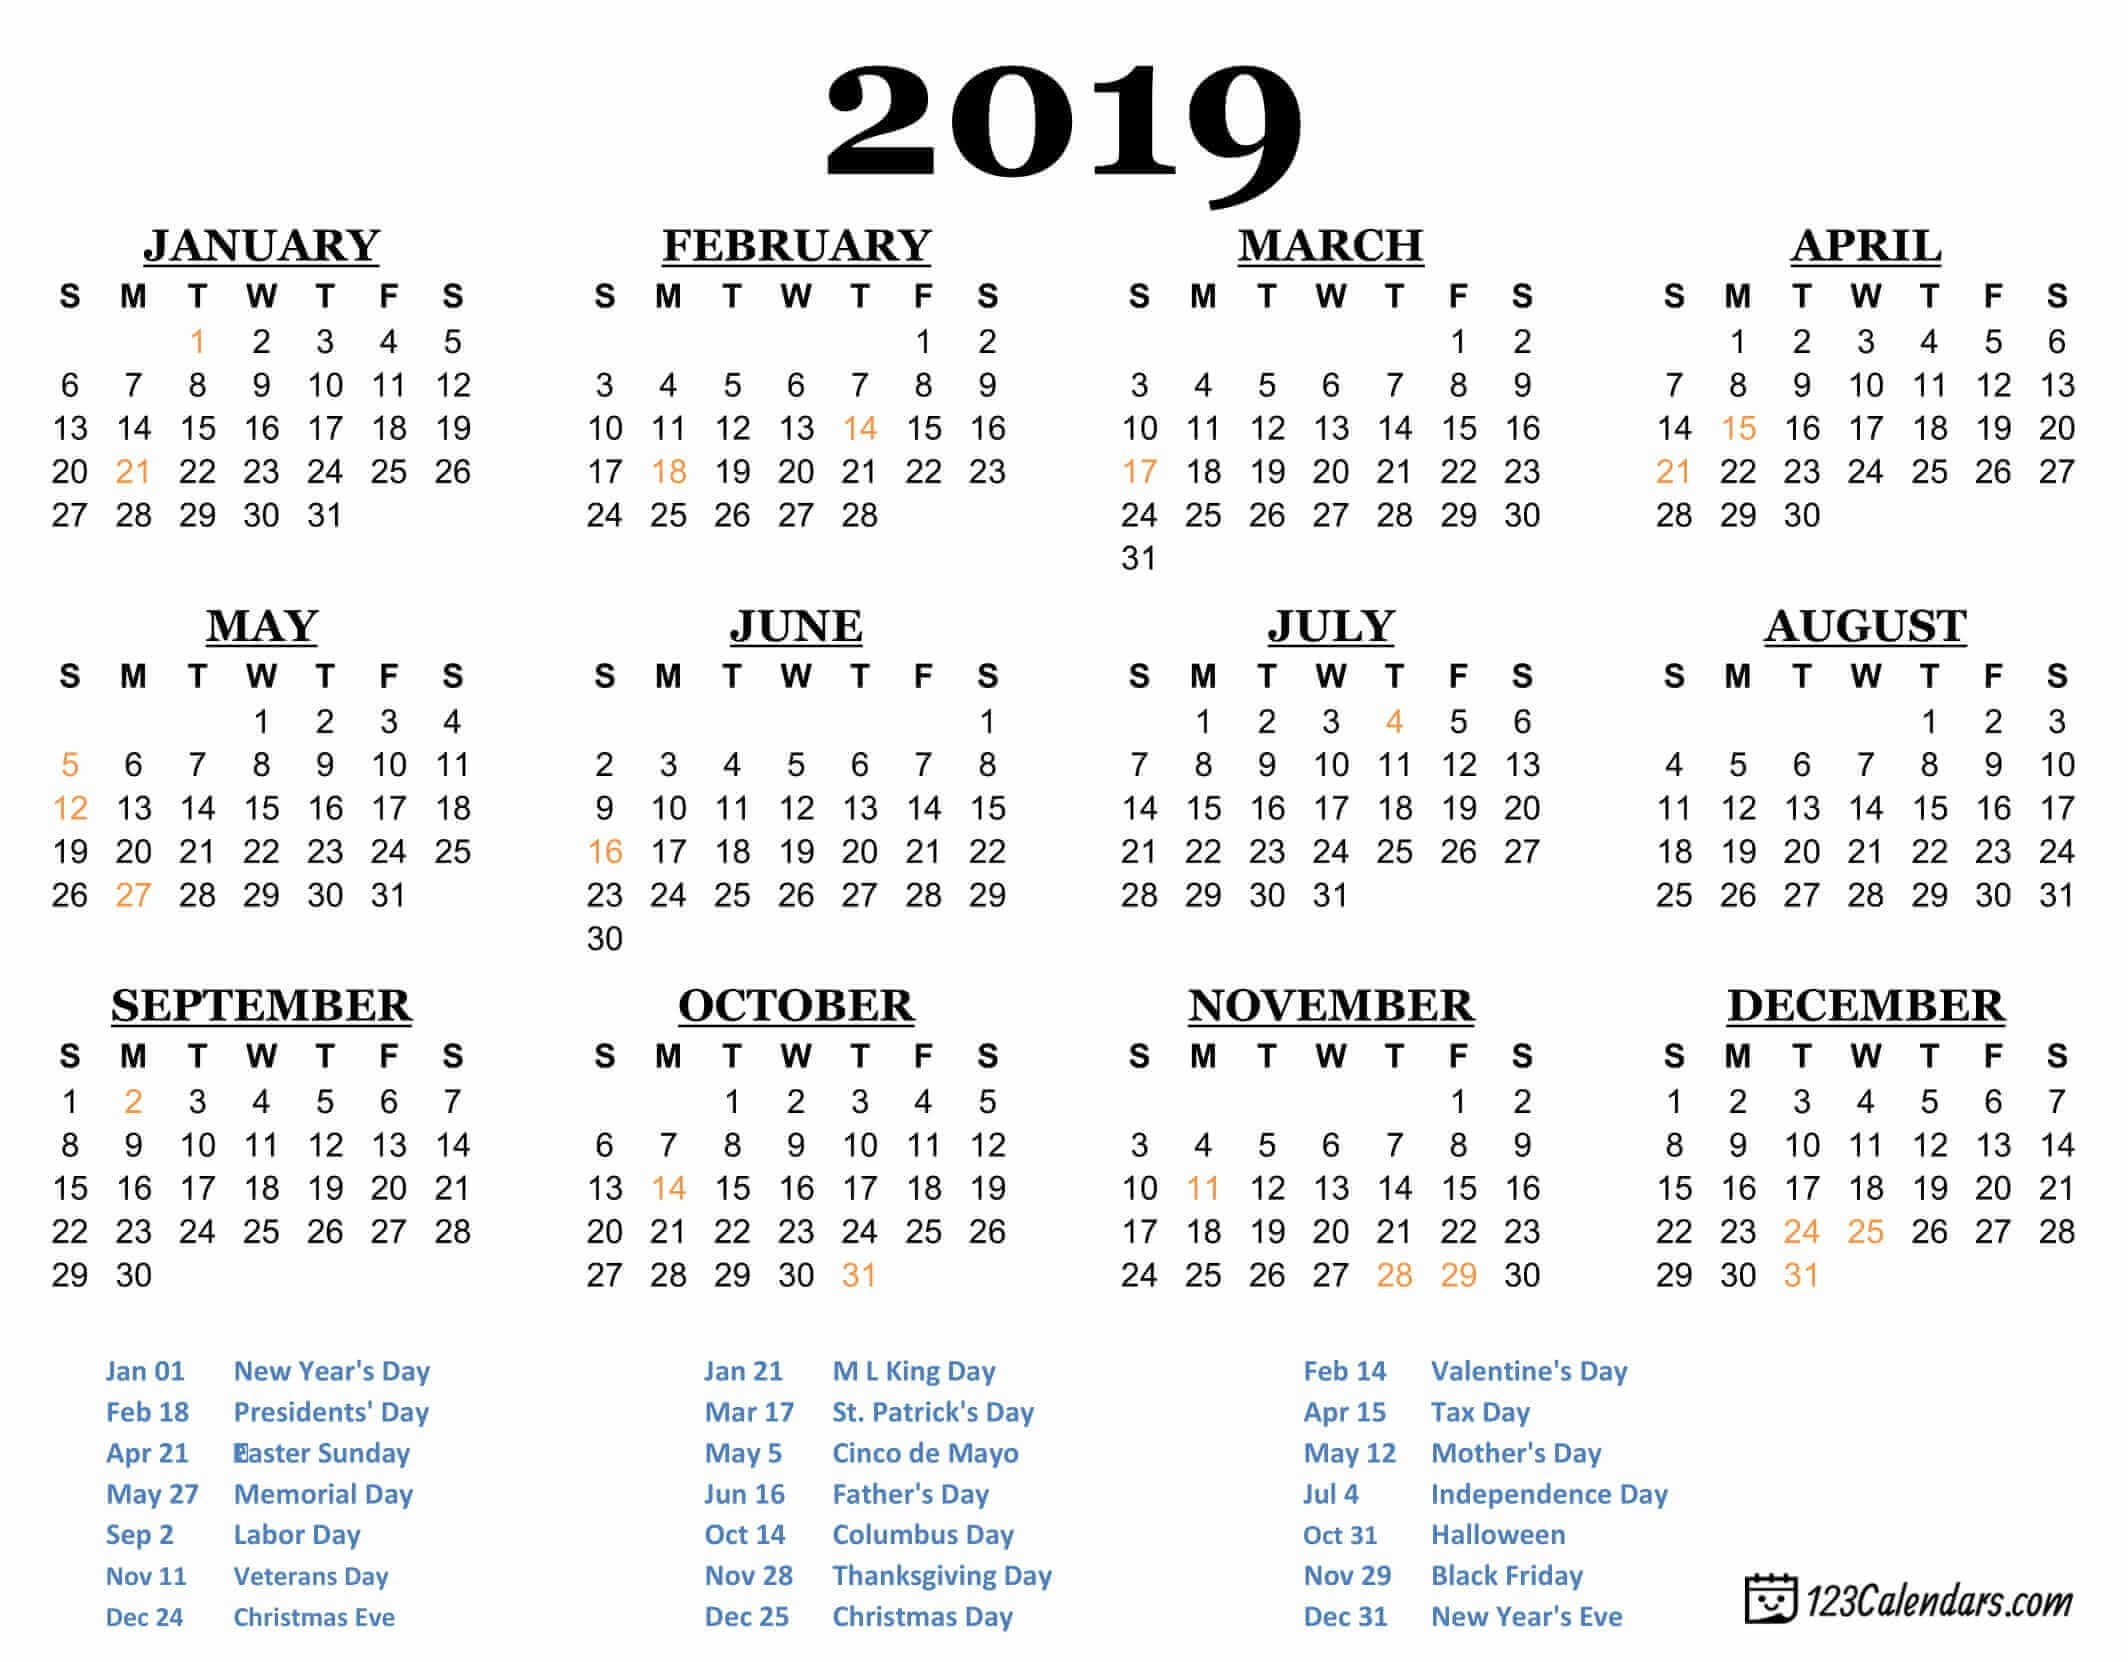 2019 Printable Calendar - 123Calendars Calendar 2019 For Print